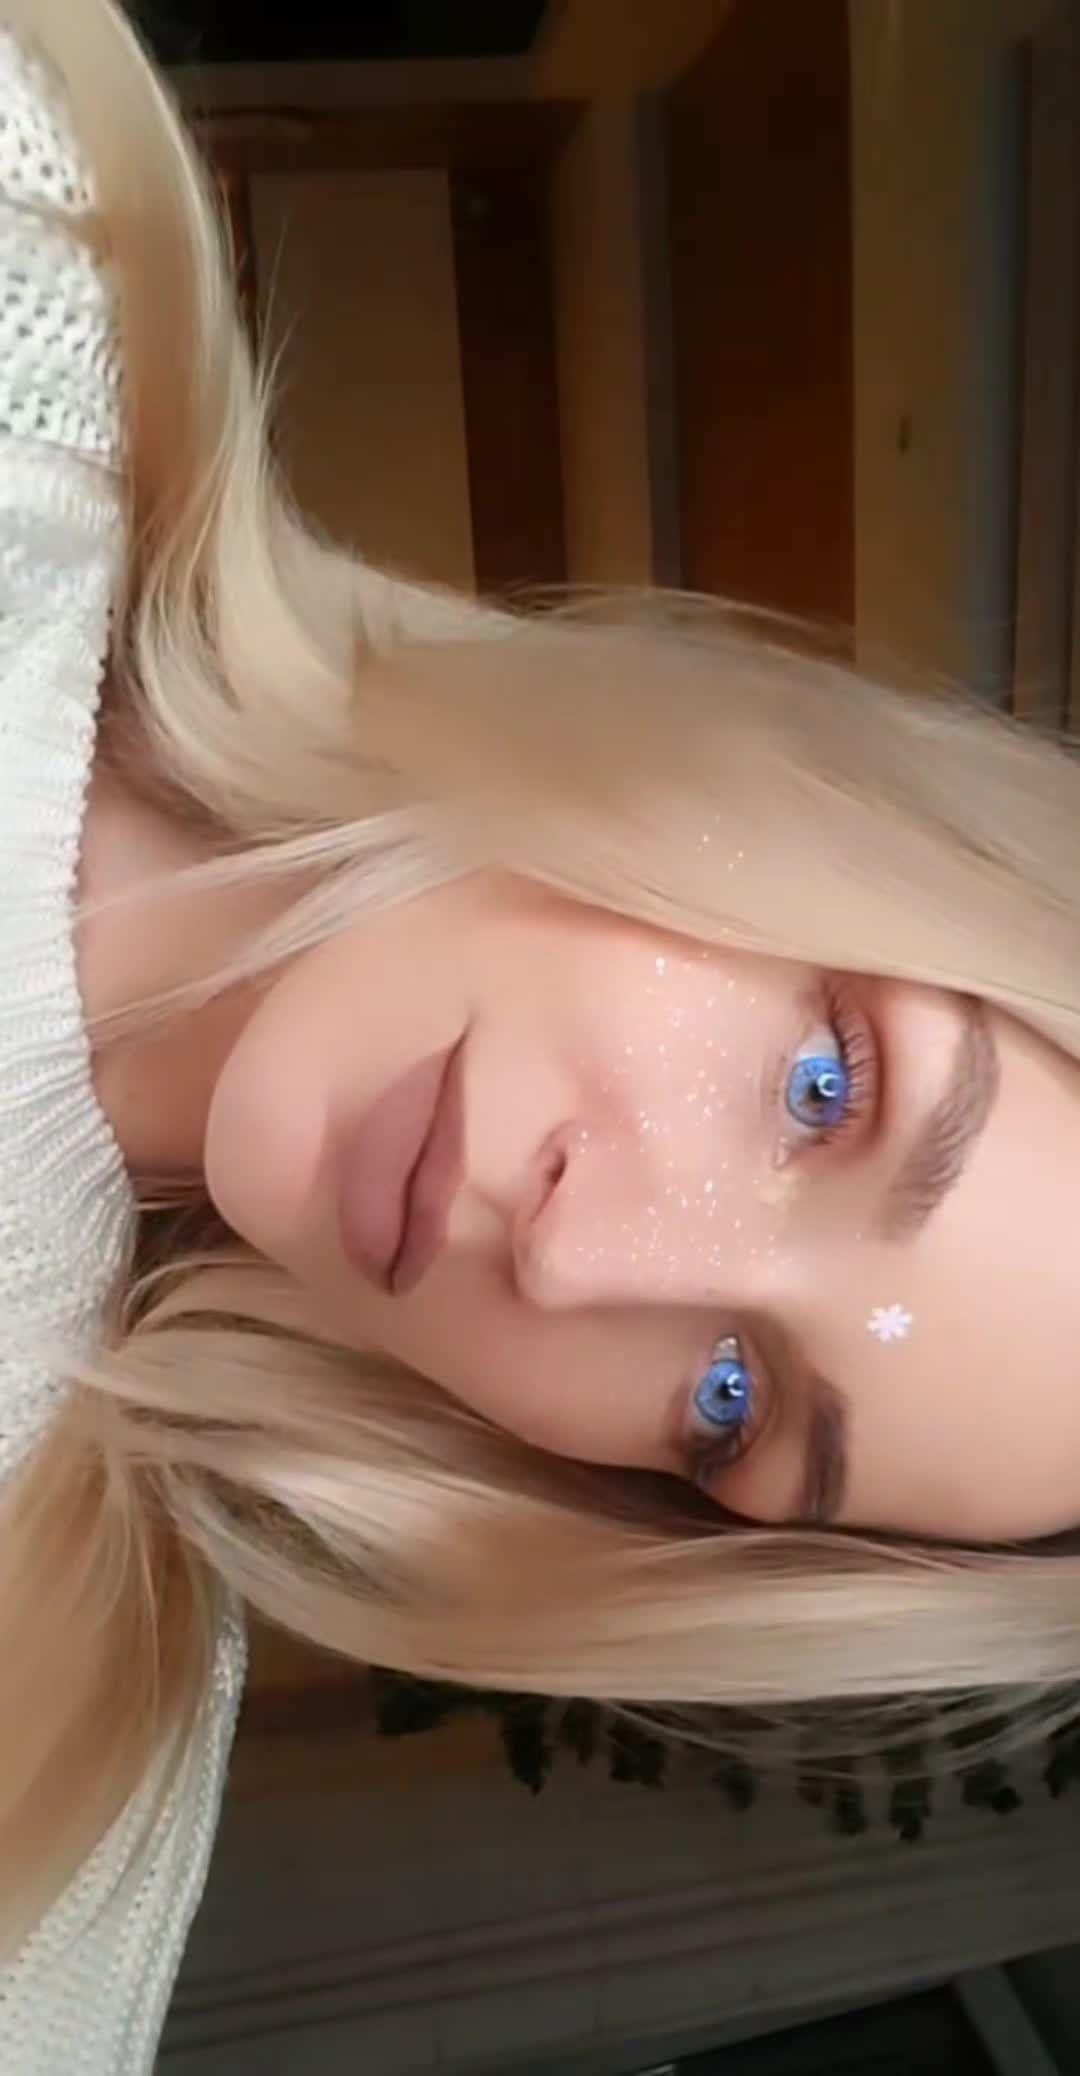 Instagram filter snowflake gem